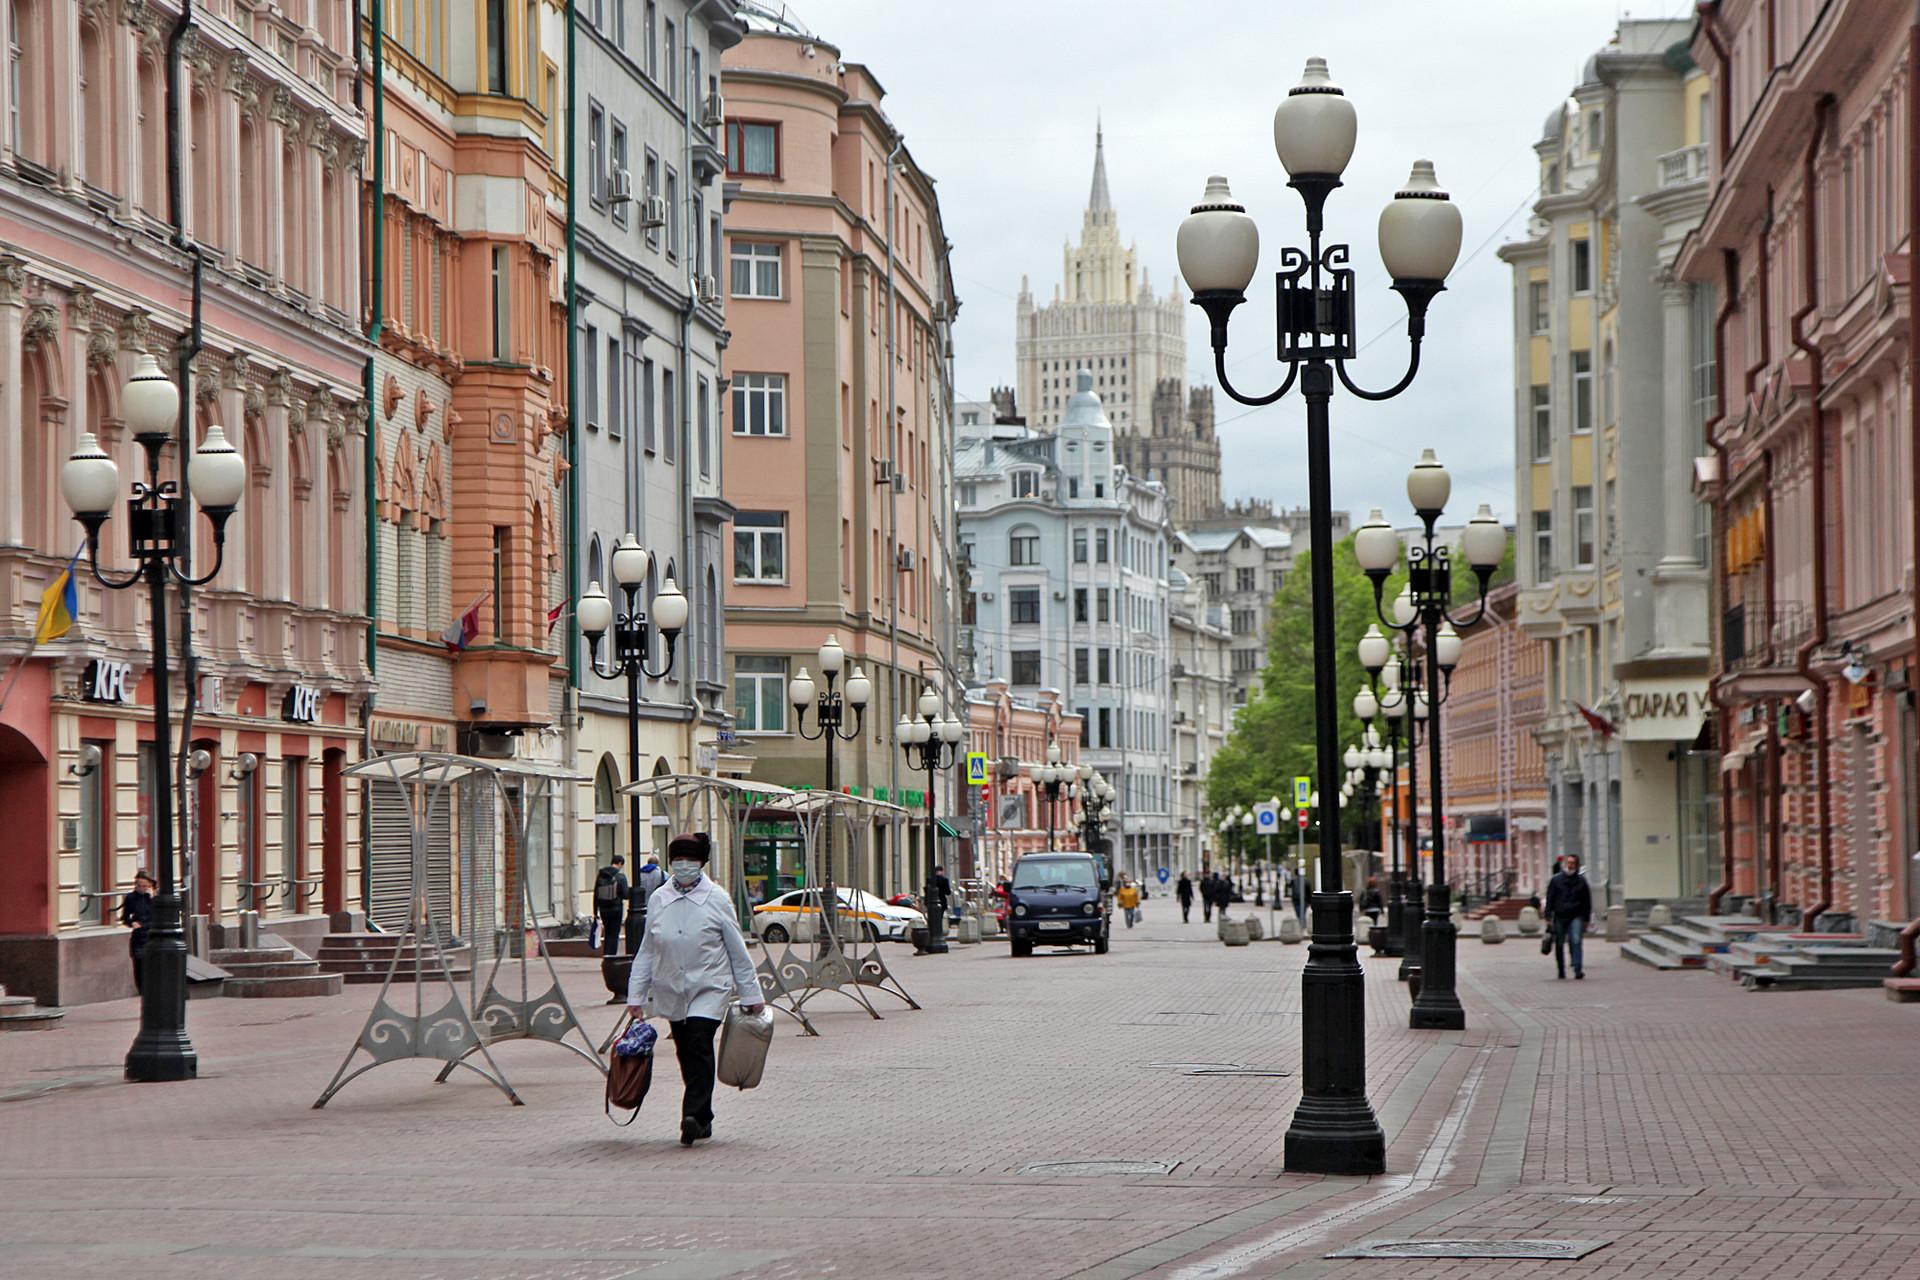 Suasana di kawasan Arbatskaya Ulitsa yang sepi. Salah satu kawasan wisata ini biasanya dipenuhi turis, pedagang, seniman, dan lain sebagainya.